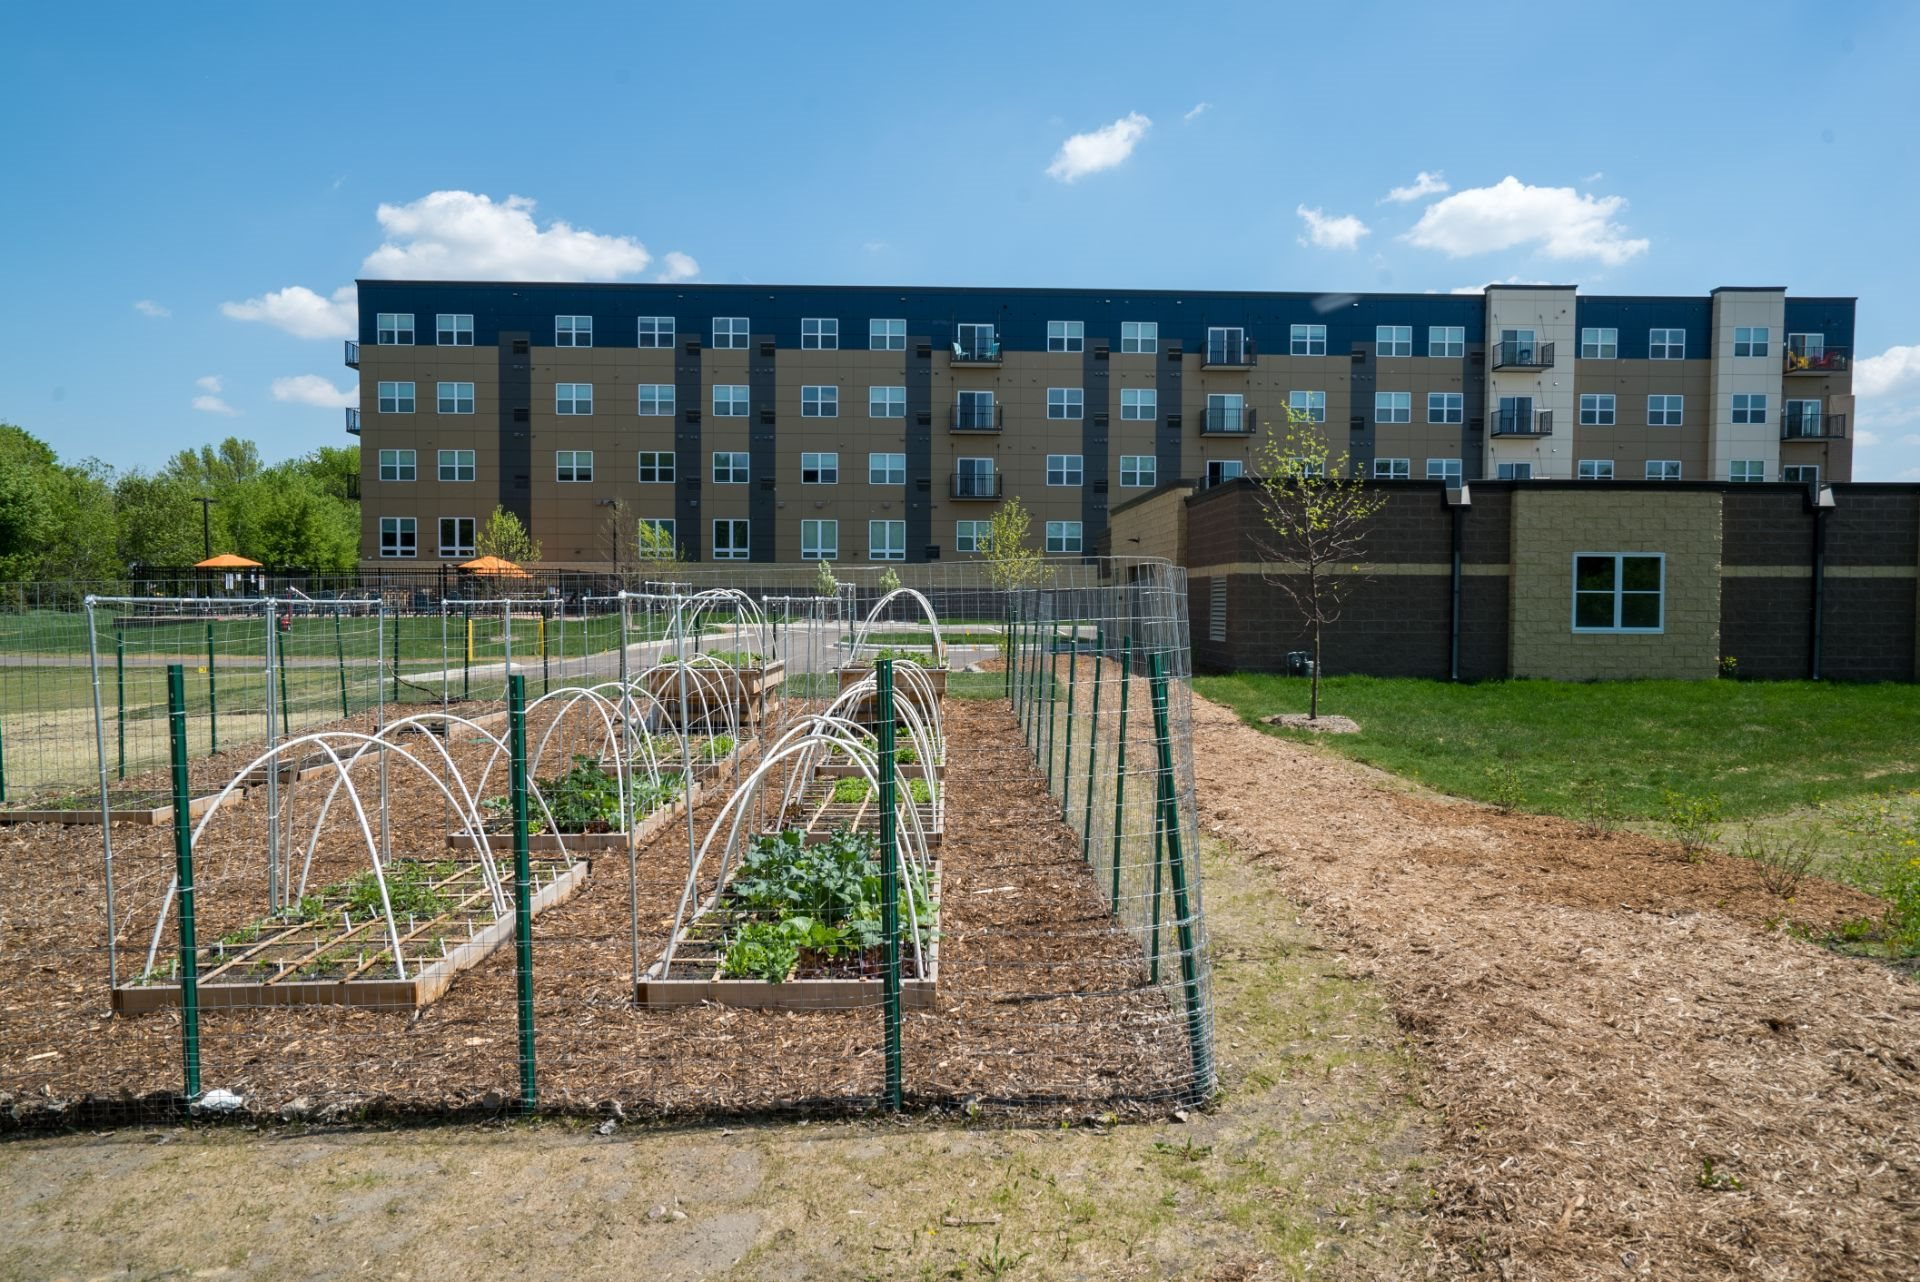 Berkshire Central Apartments with Community Garden- 9436 Ulysses Street NE  Blaine, MN.  55434